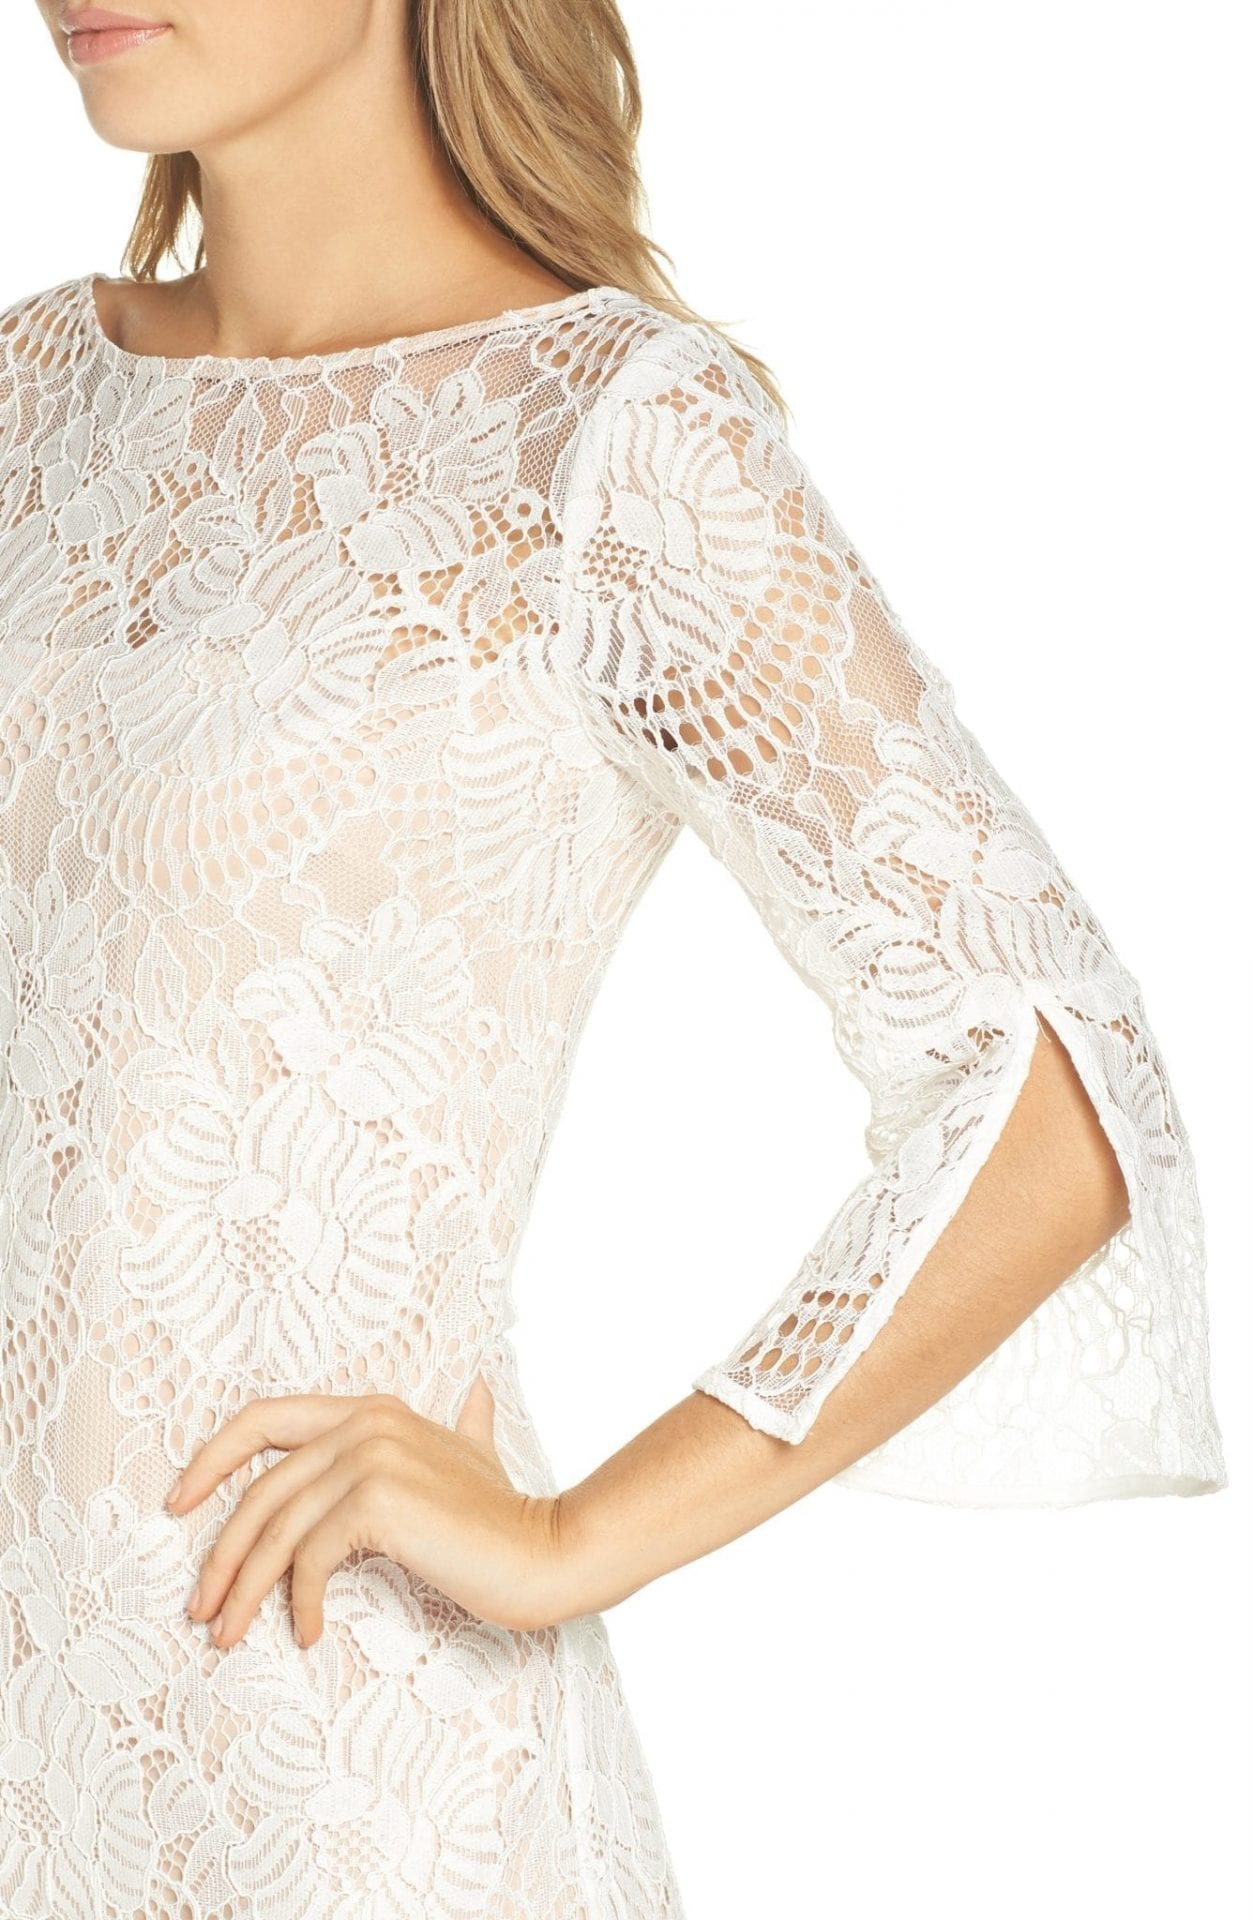 Vince Camuto Lace Shift Ivory Dress